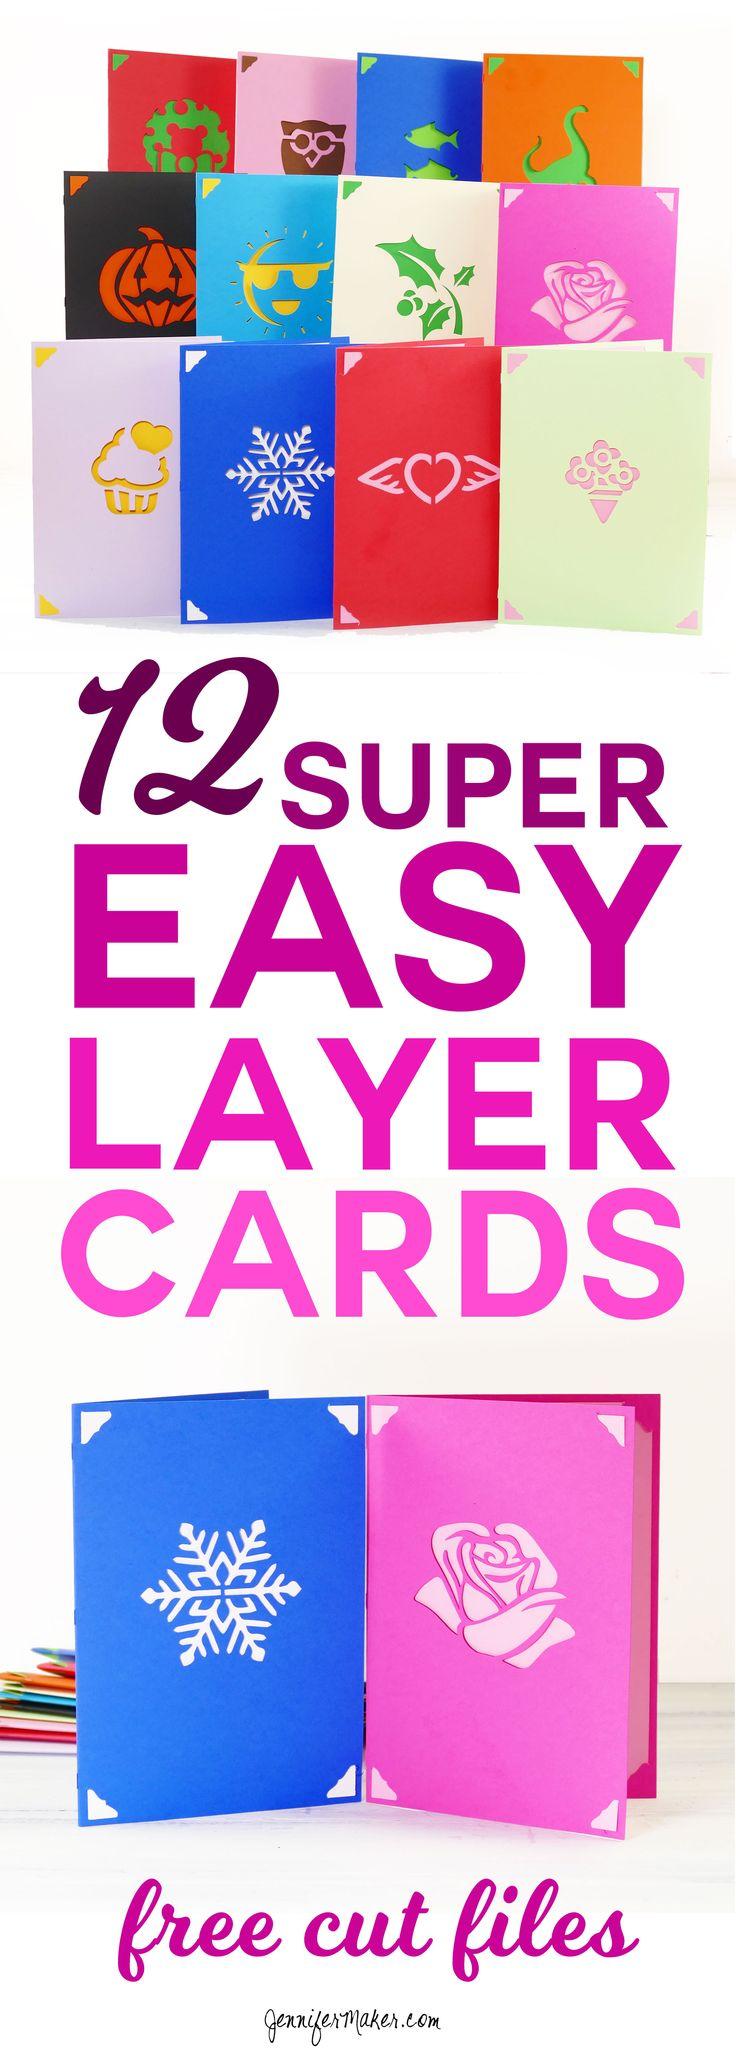 DIY Greeting Card Set Fast, Easy Layers! Jennifer